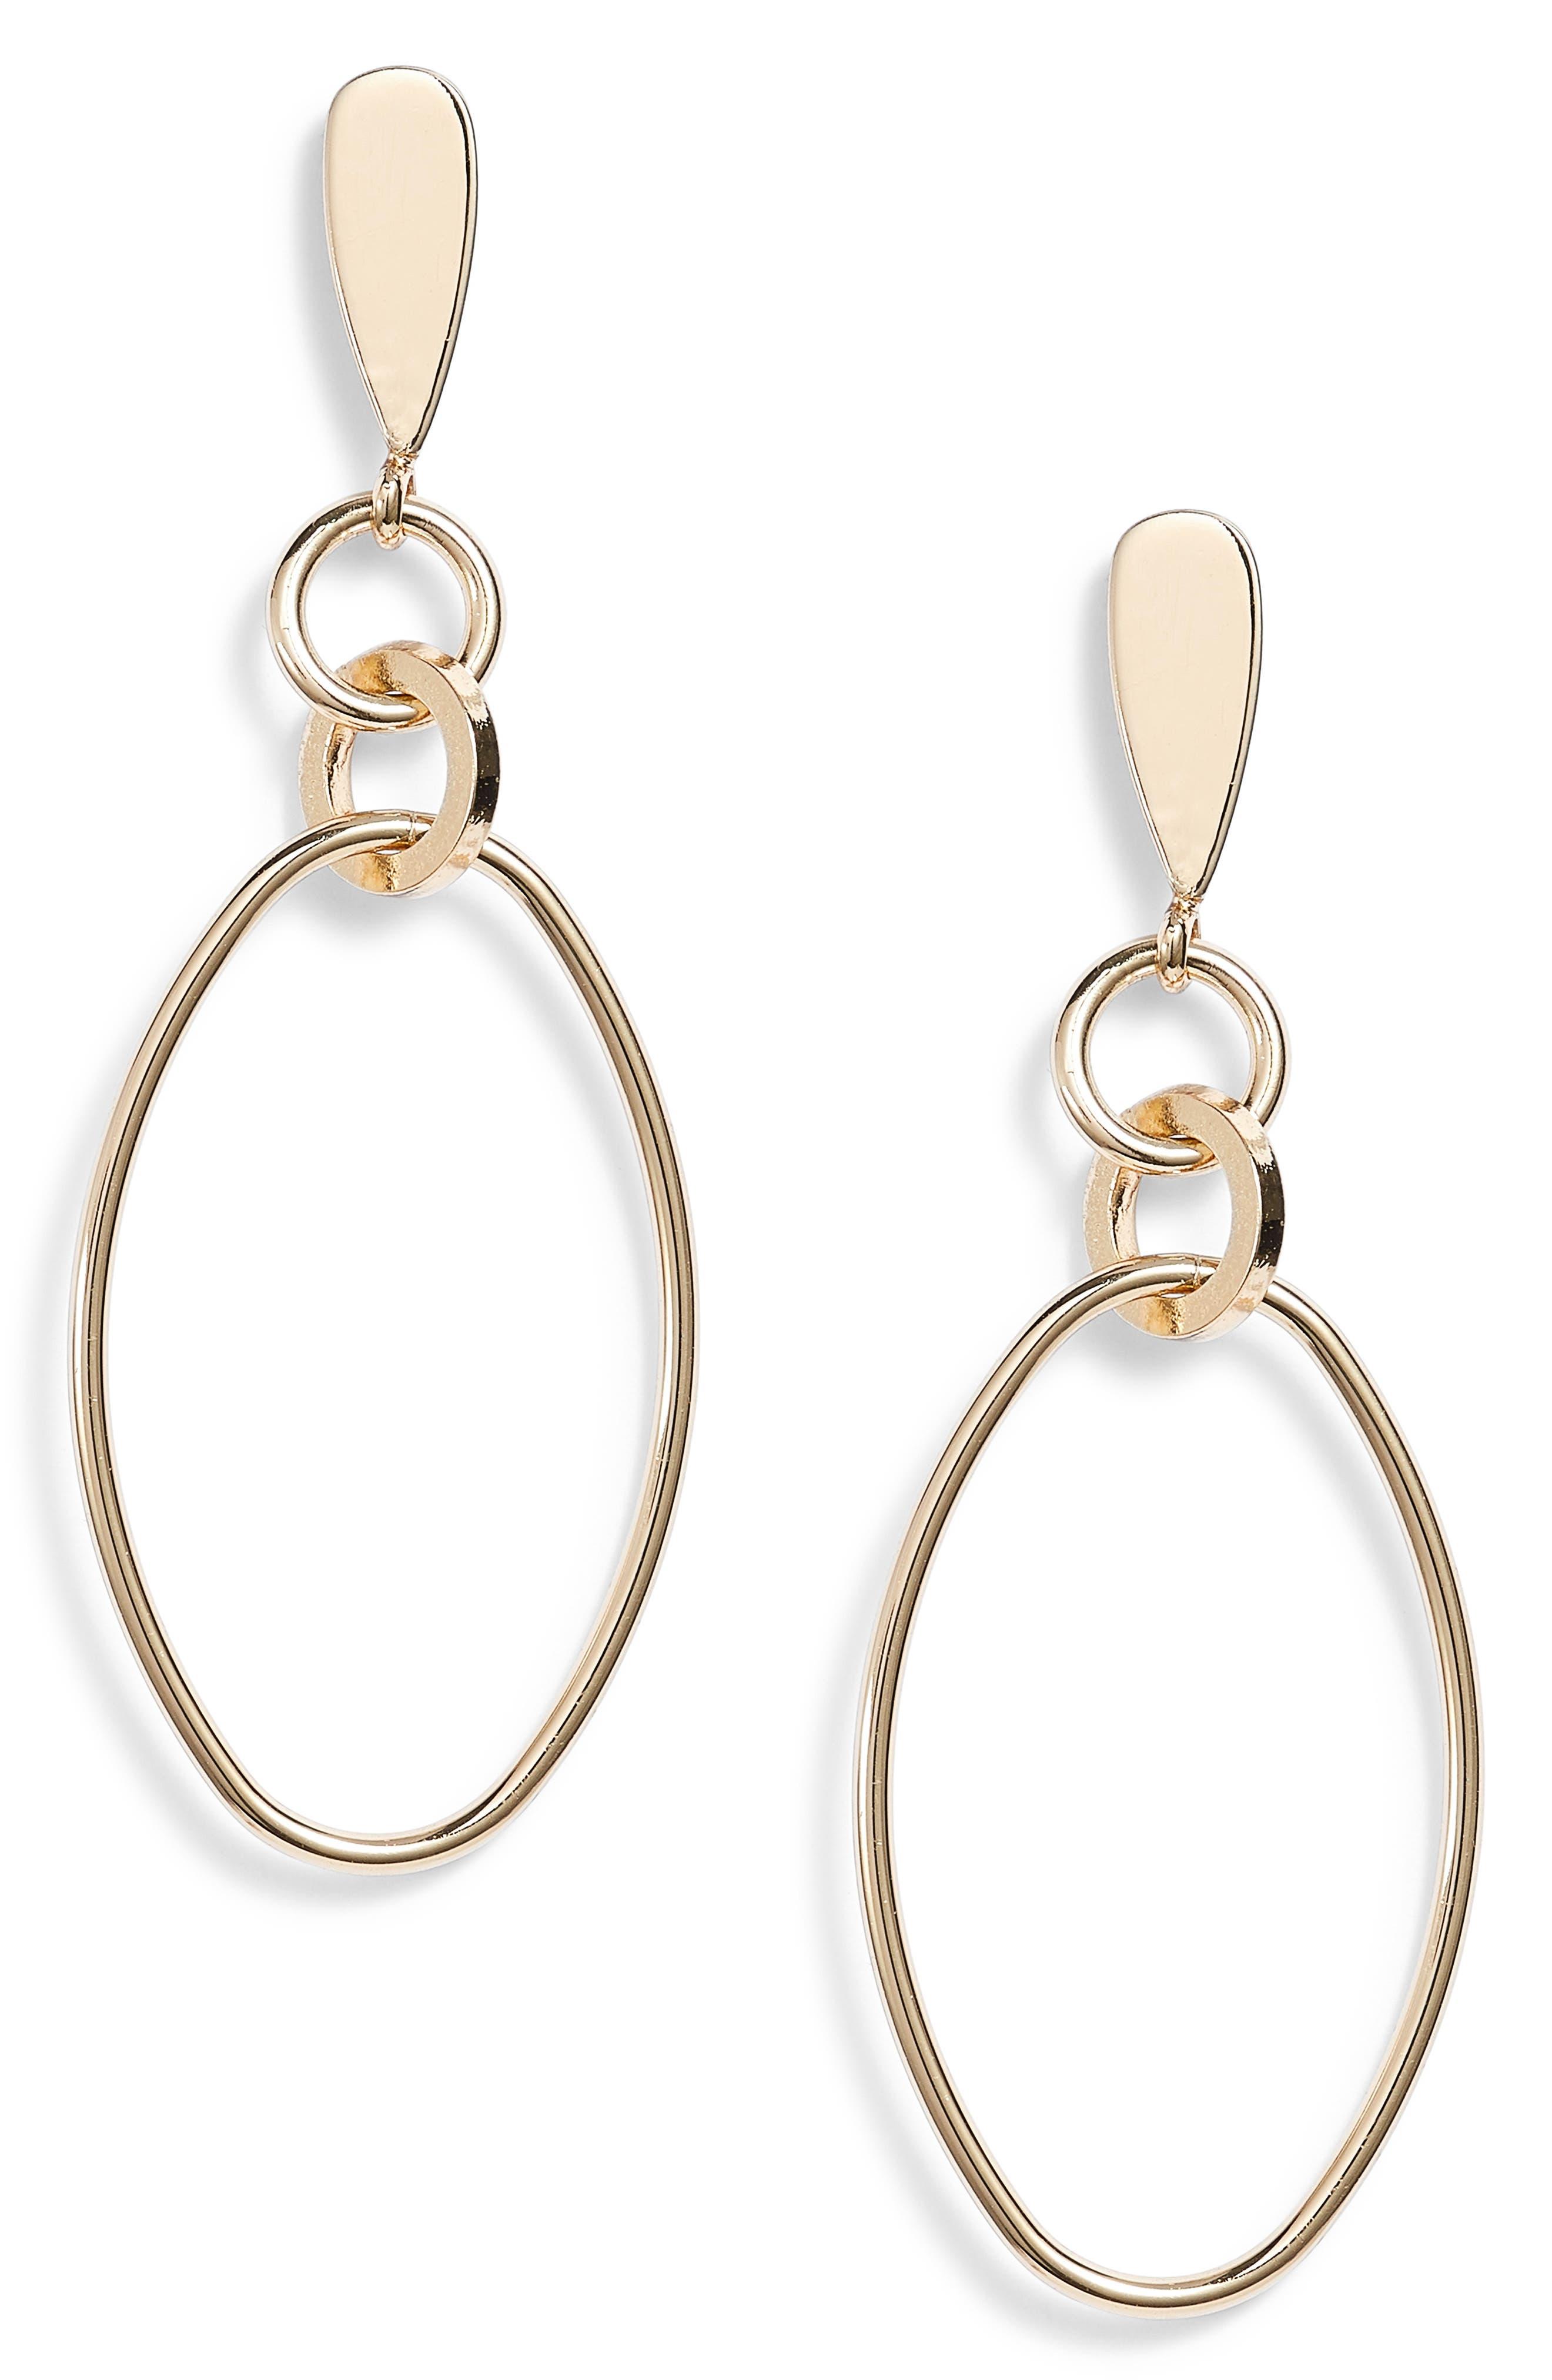 Oval Orbit Front Hoop Earrings,                         Main,                         color, Gold